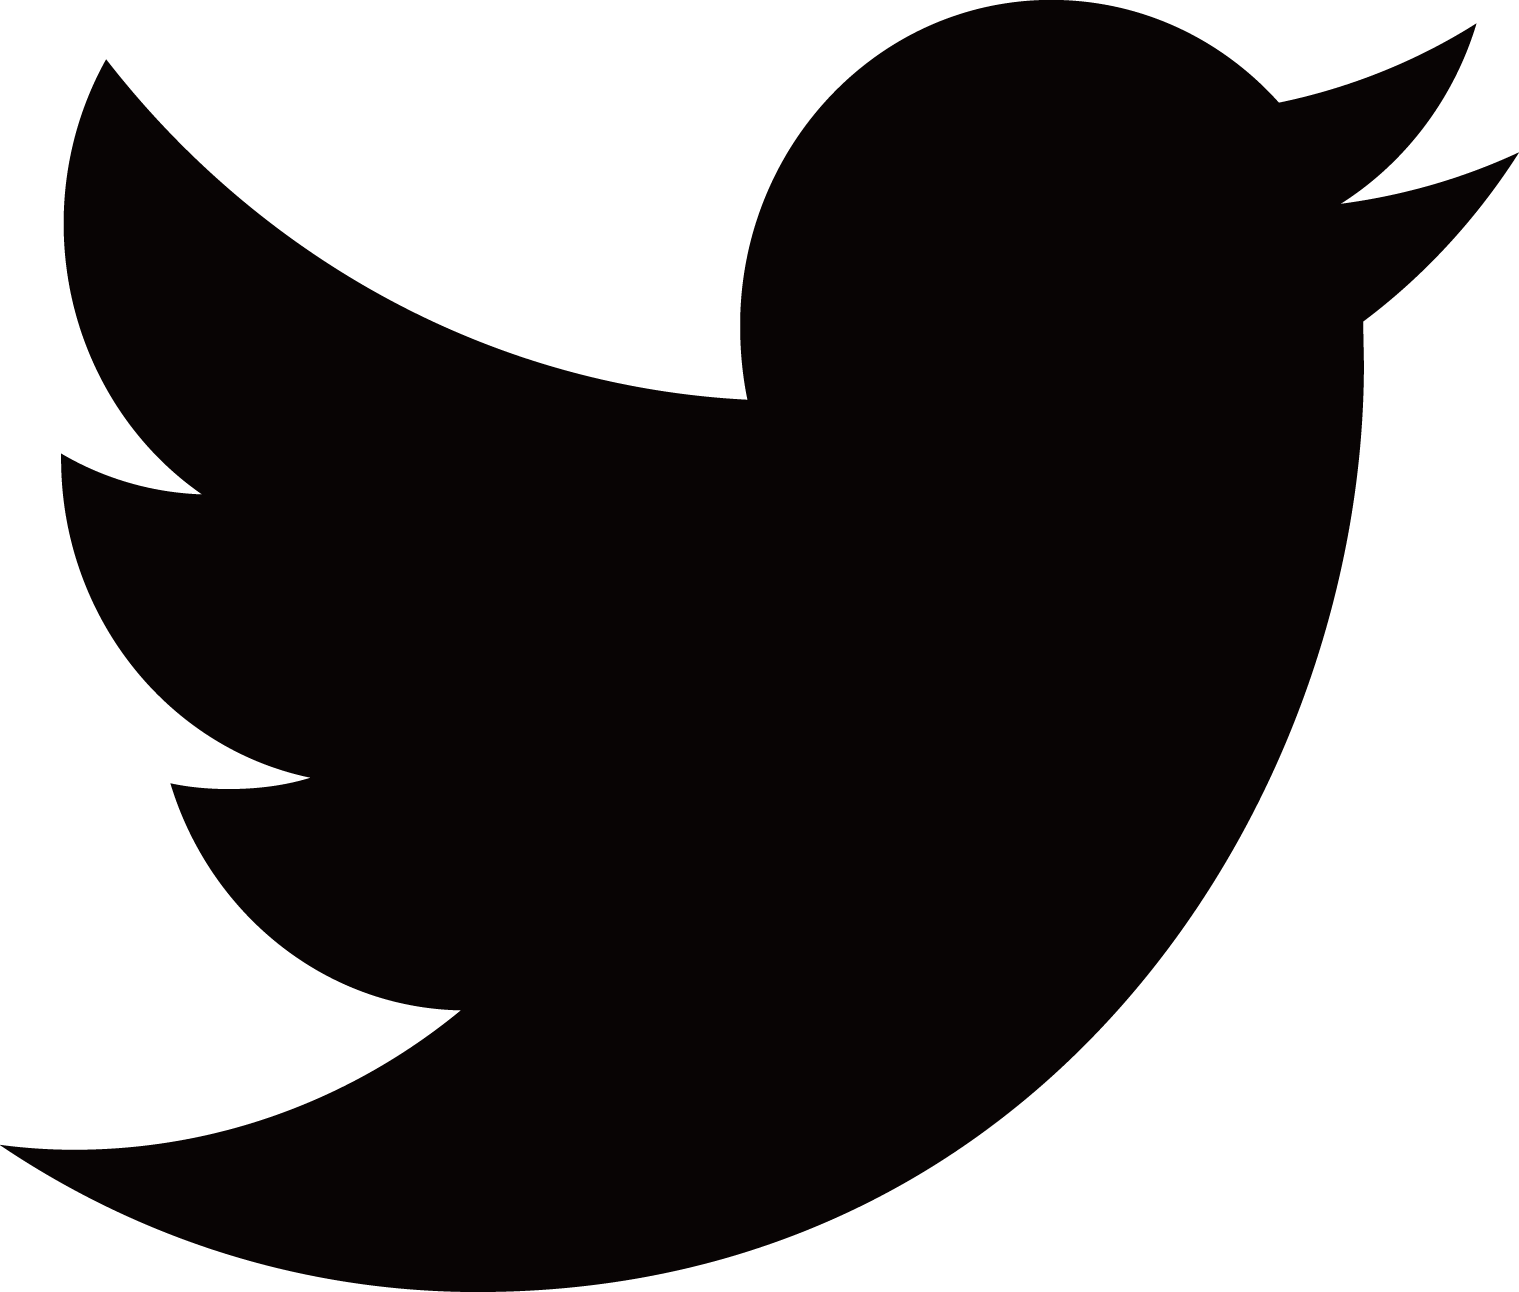 Twitter Logo Png Transparent Background.